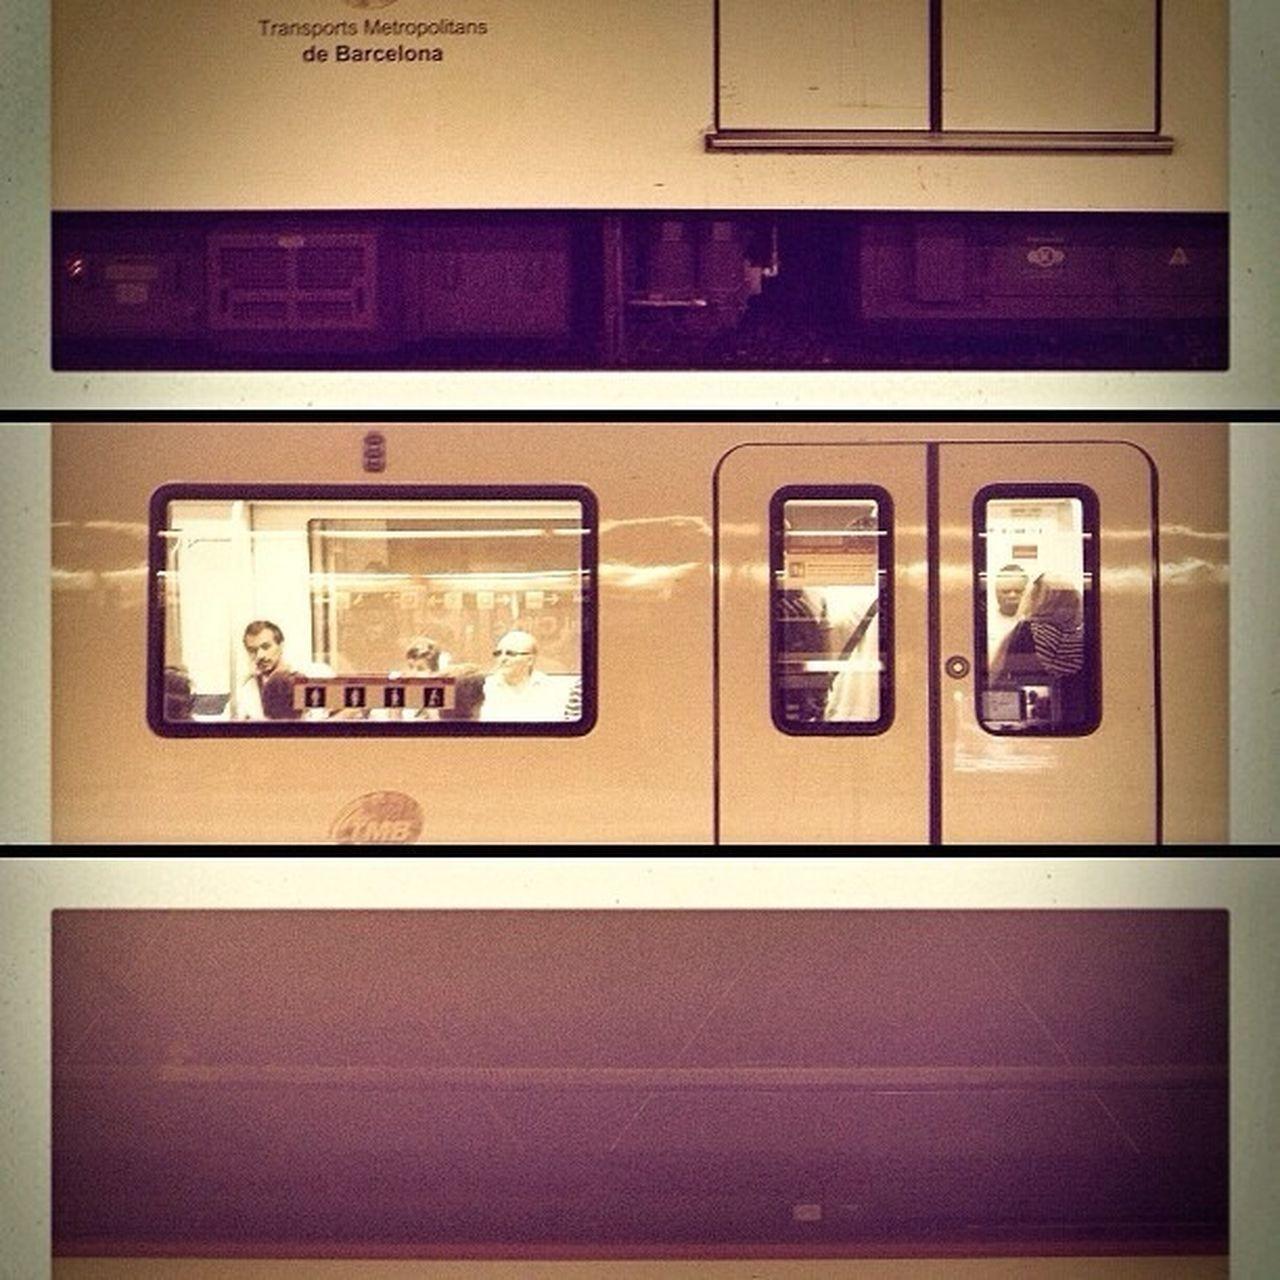 train - vehicle, public transportation, transportation, rail transportation, indoors, railroad station, technology, subway train, communication, railroad station platform, no people, day